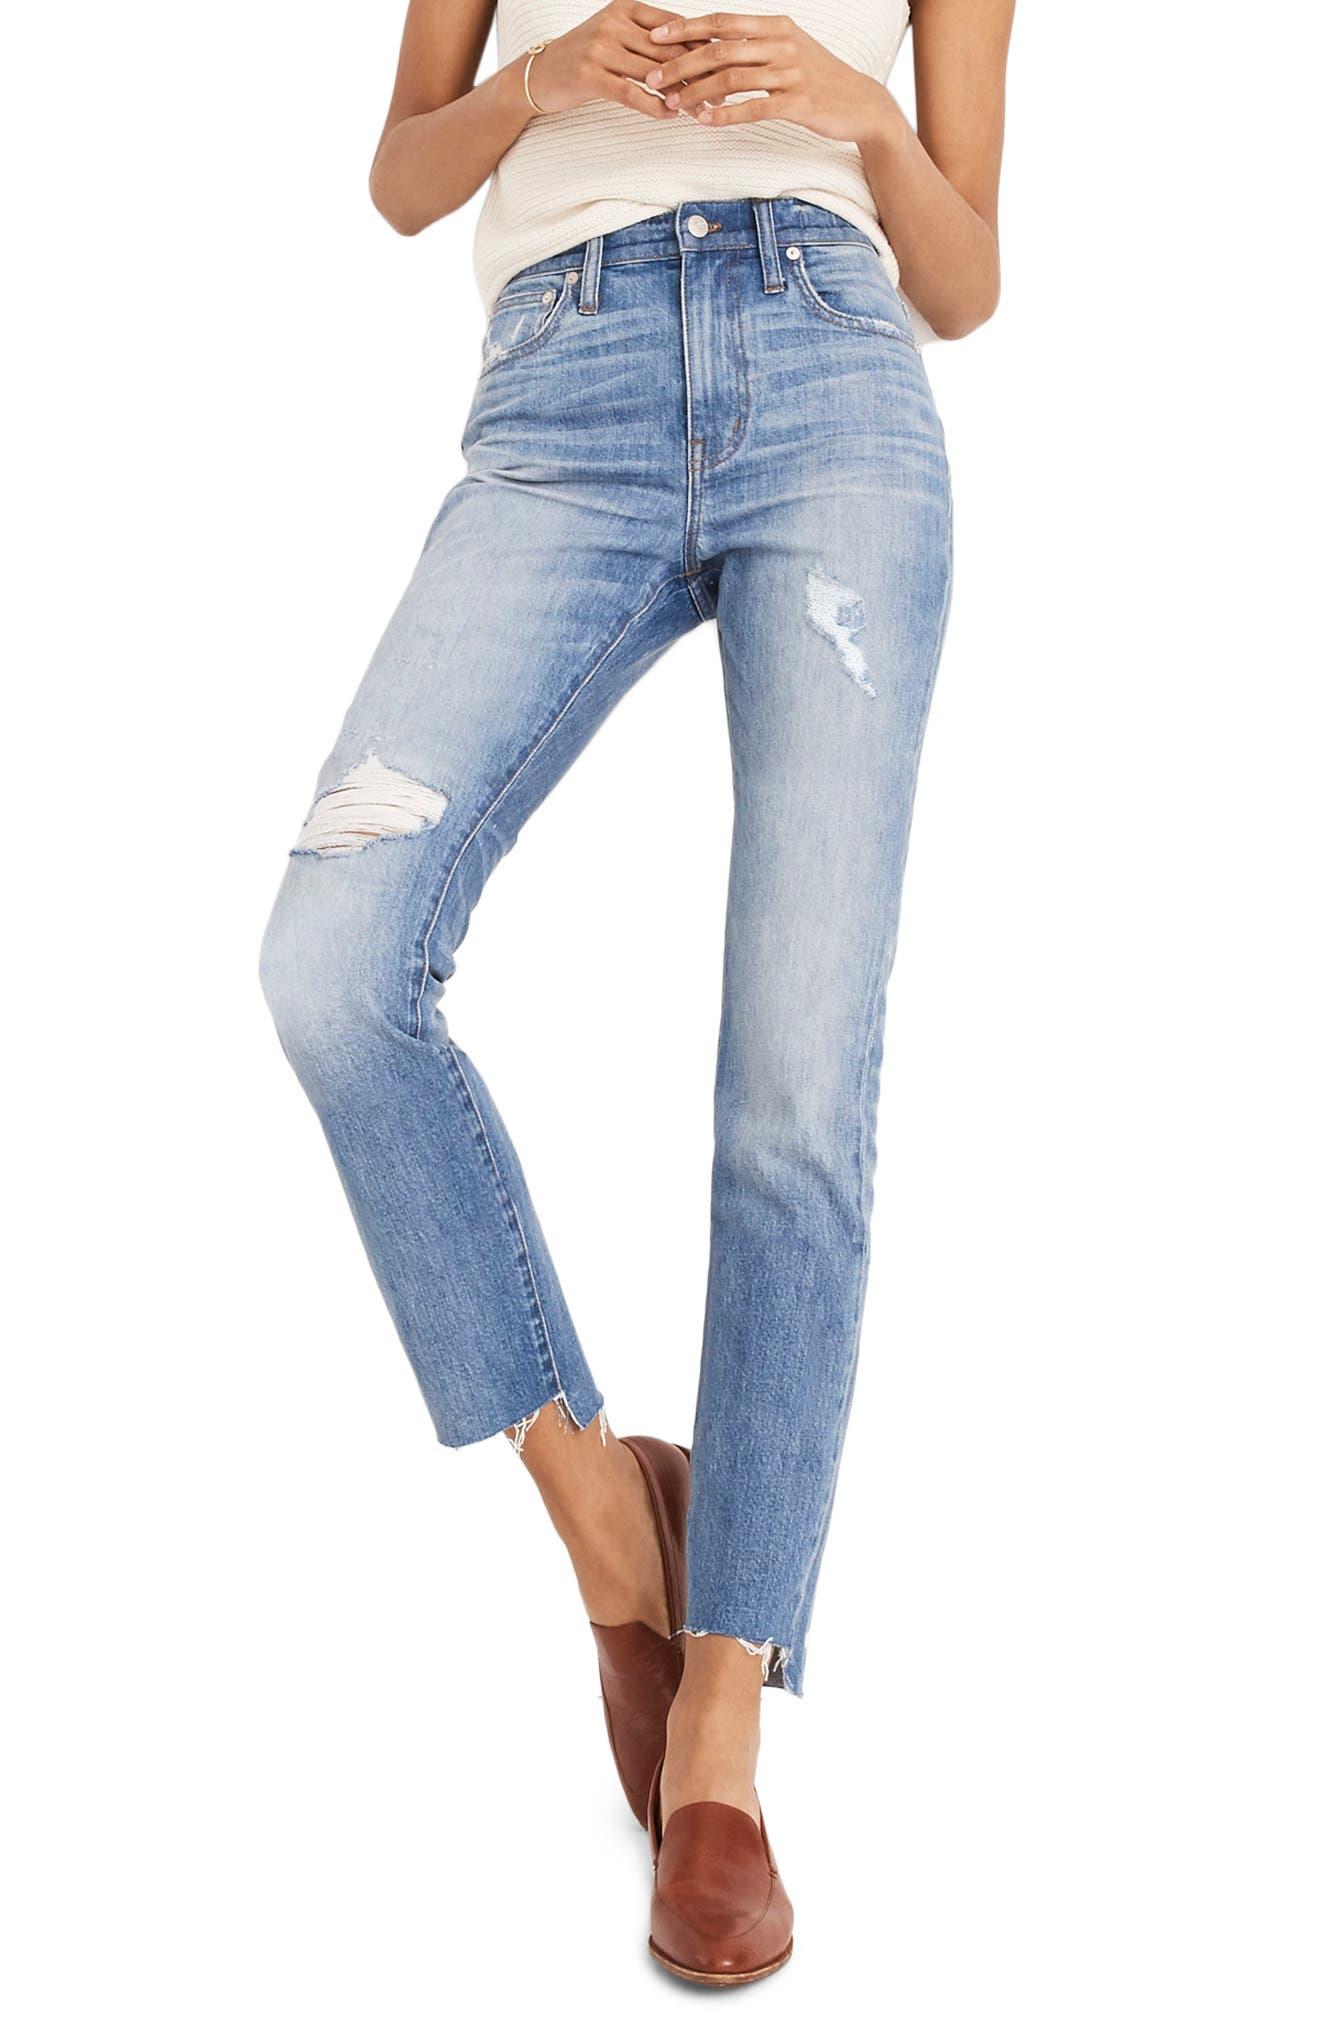 The High Waist Step Hem Slim Boy Jeans in Lita